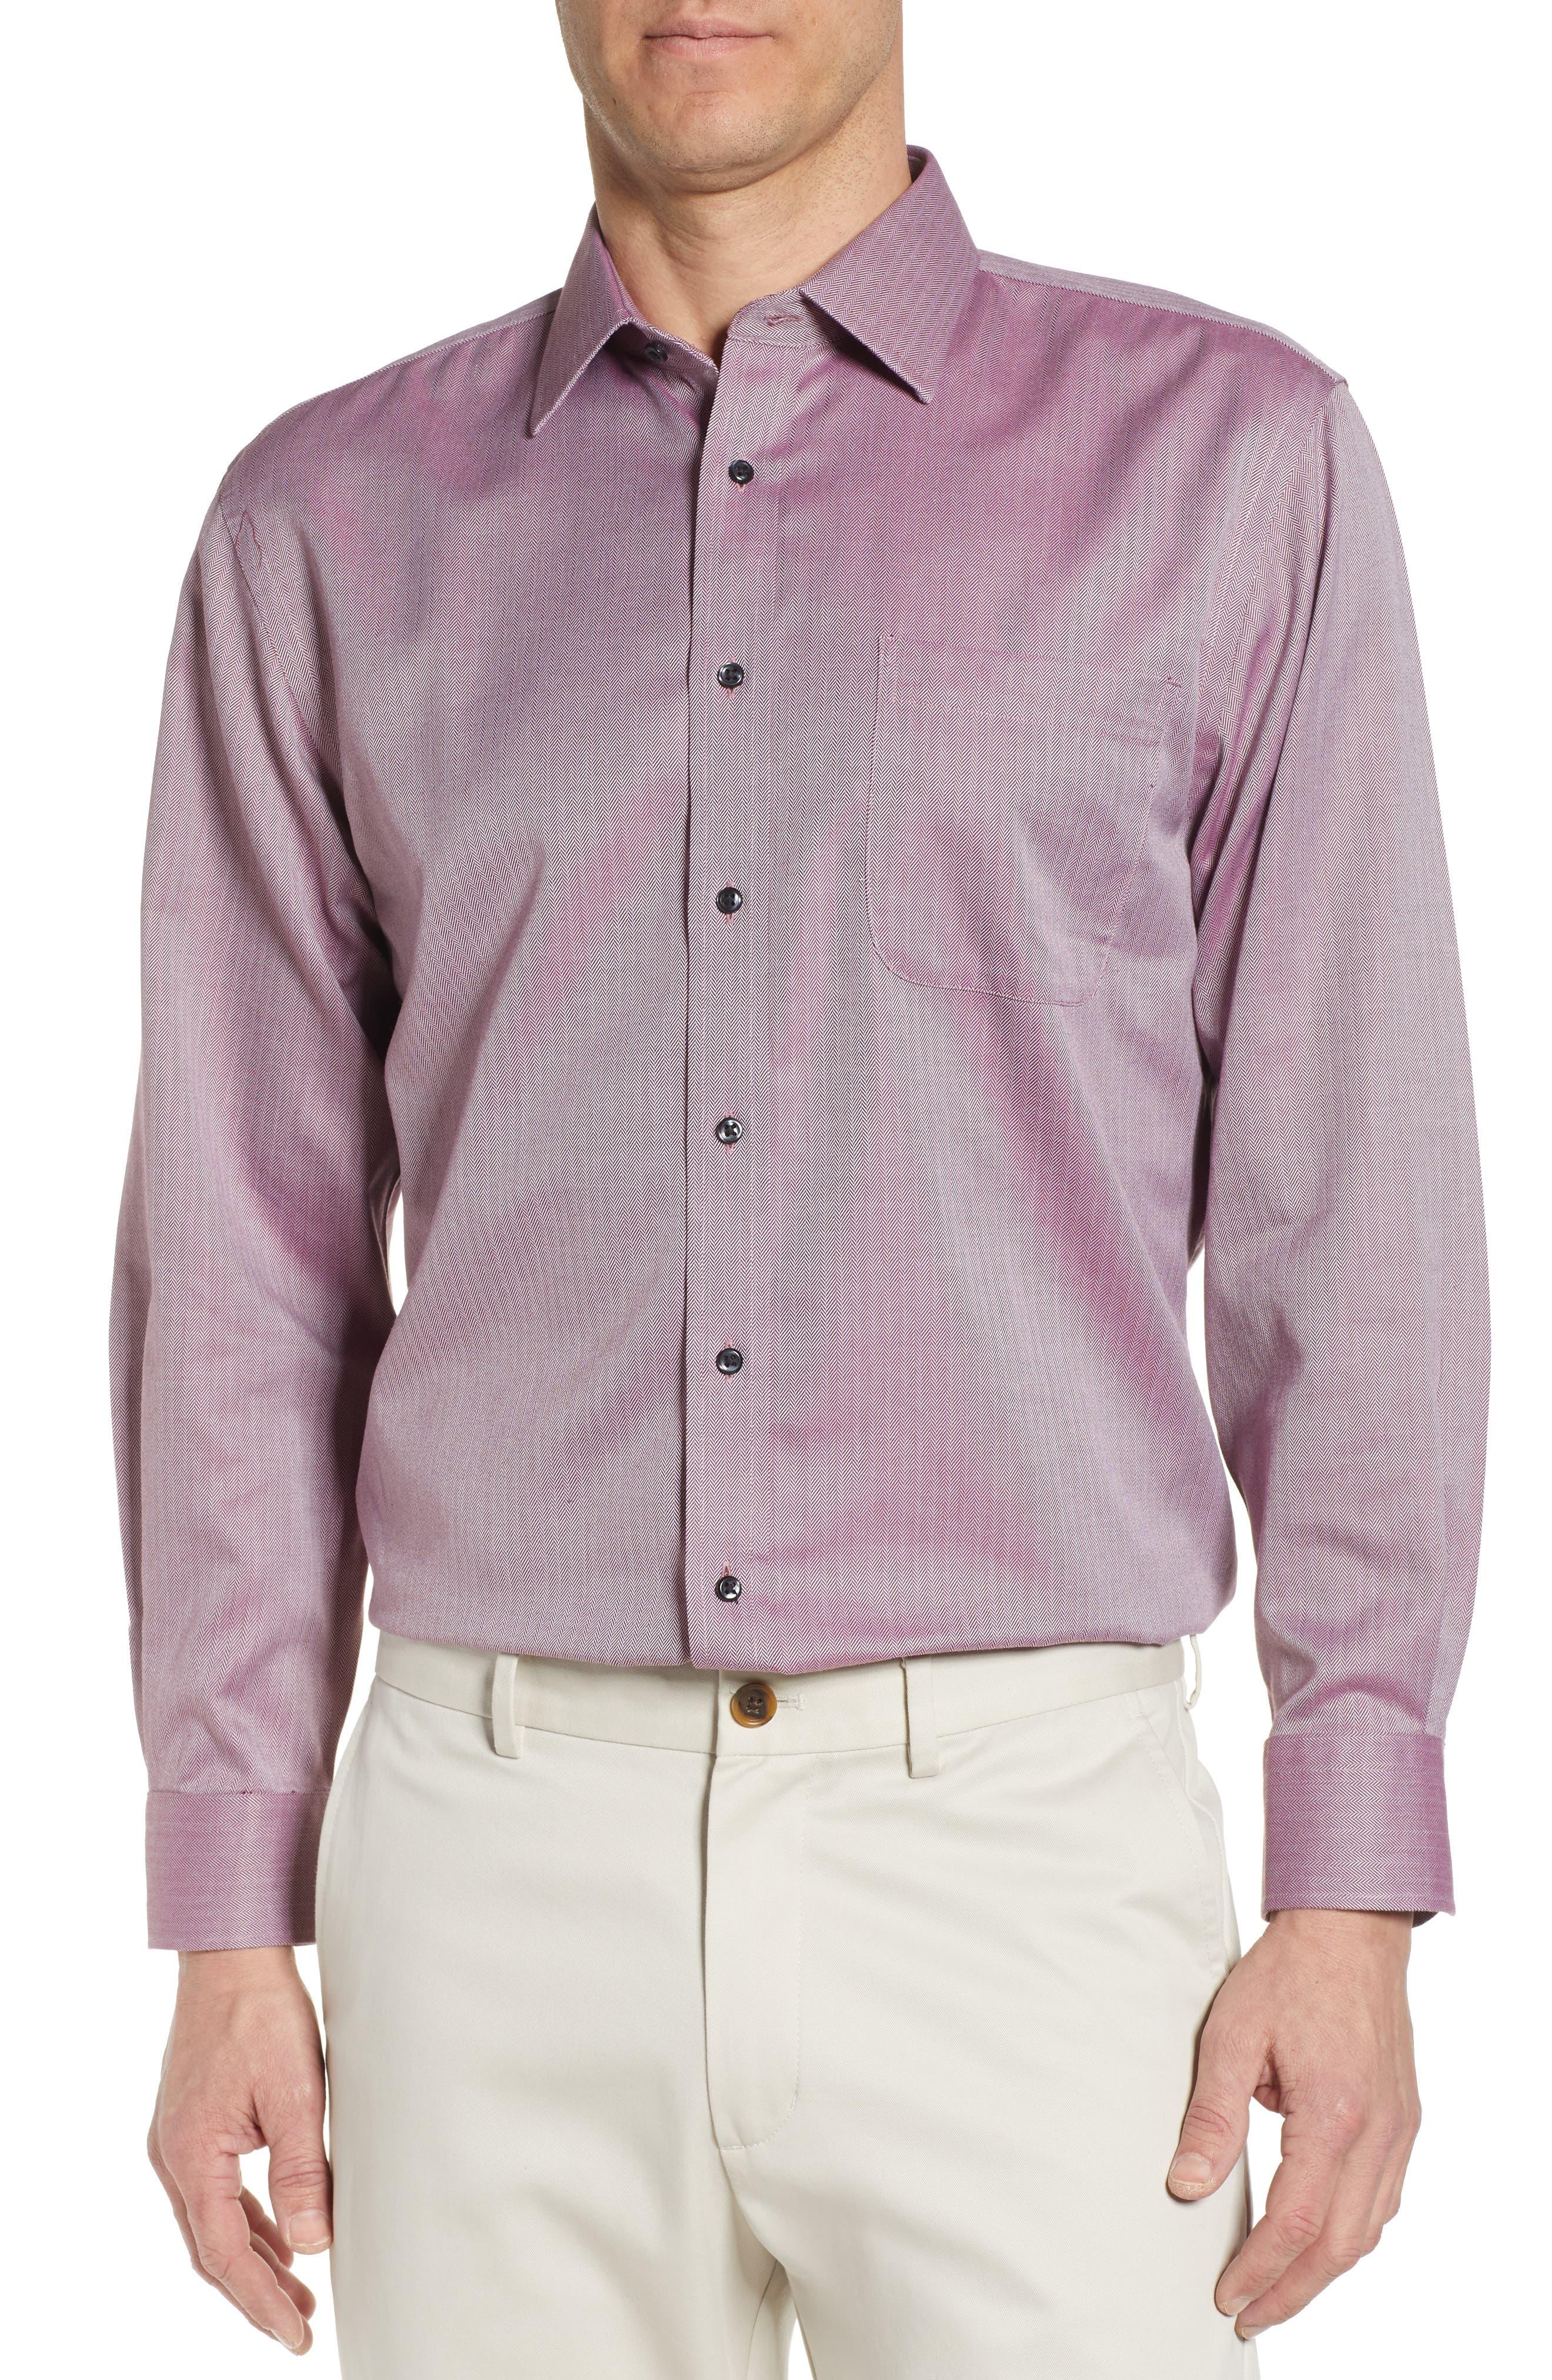 NORDSTROM MEN'S SHOP, Smartcare<sup>™</sup> Traditional Fit Herringbone Dress Shirt, Main thumbnail 1, color, BURGUNDY ROYALE